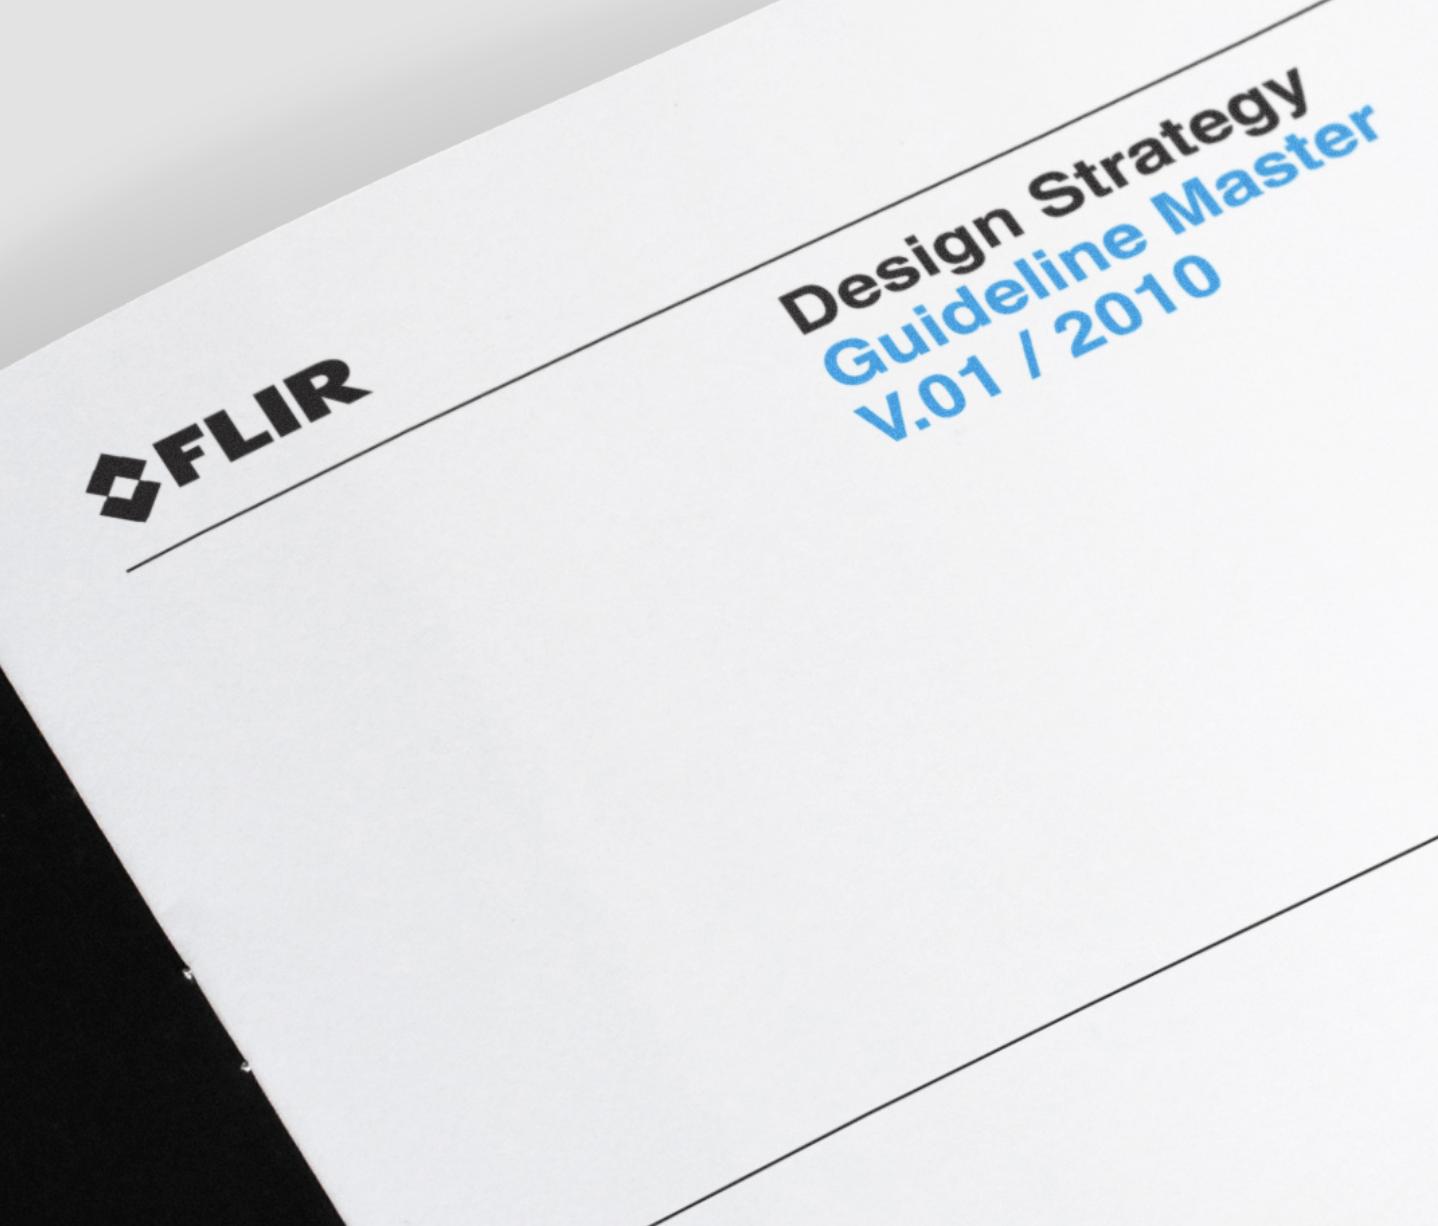 Flir  Return on design investment  Design strategy, Eco system design